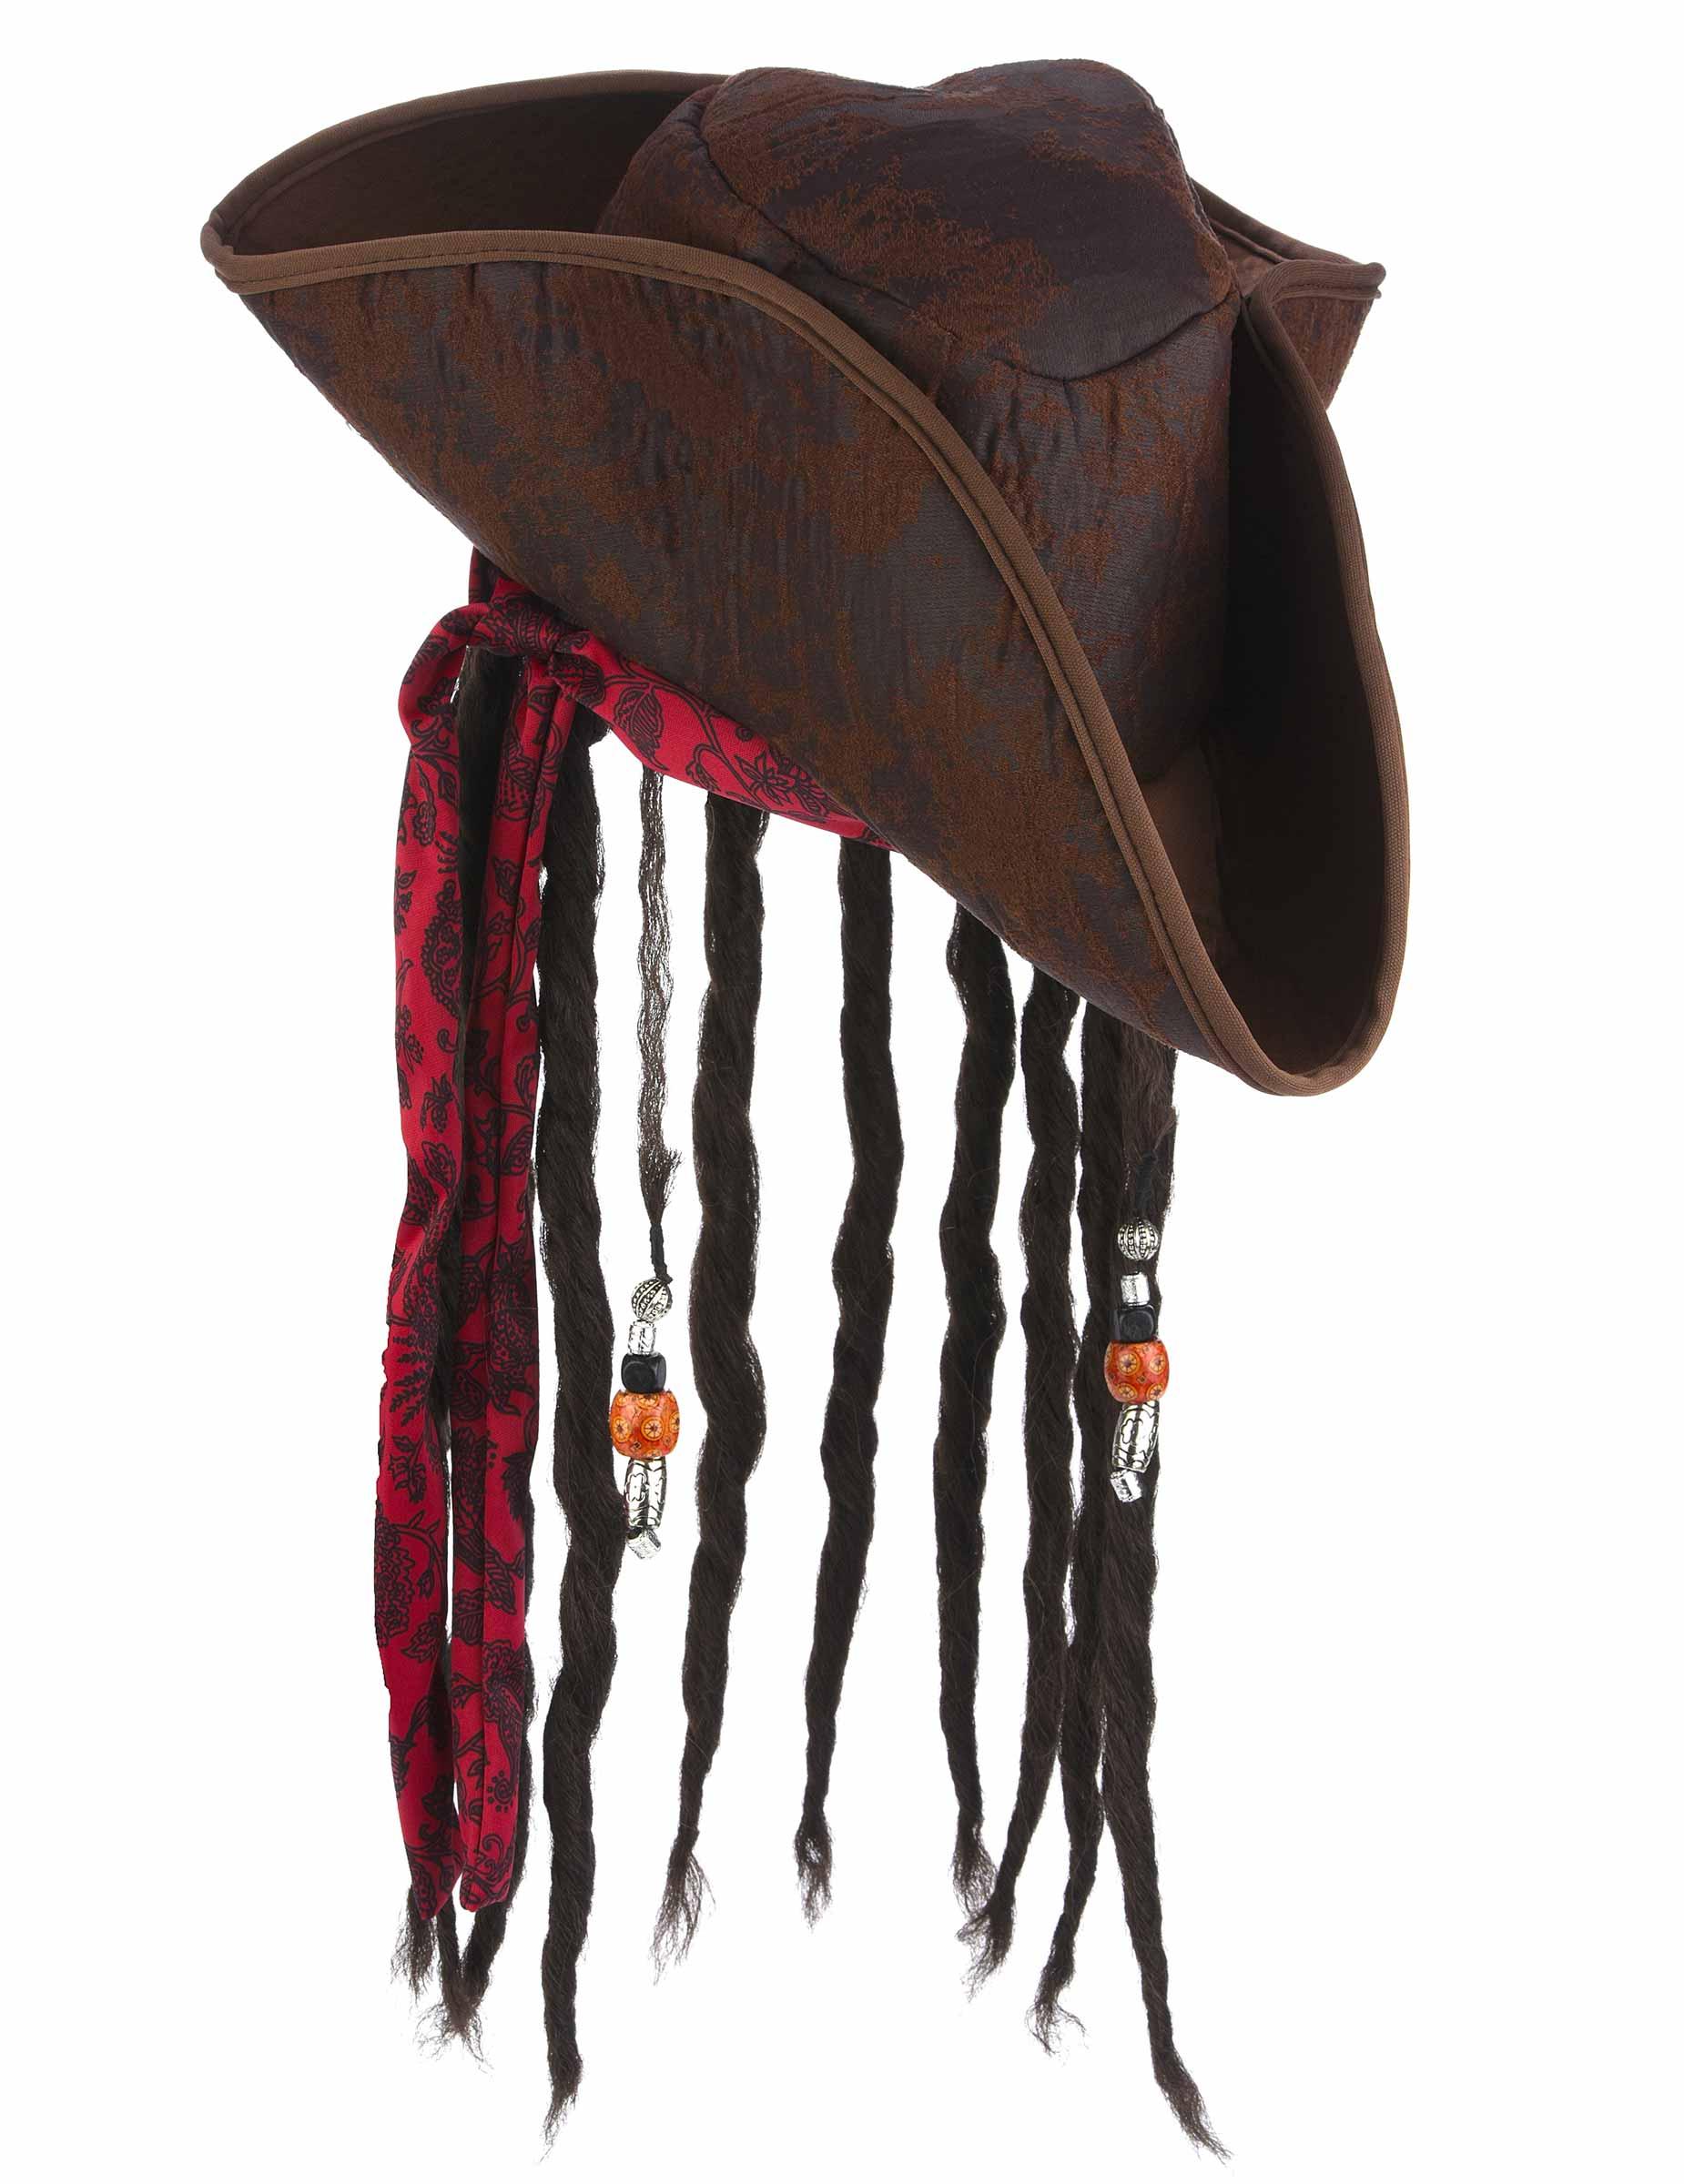 Chapéu de pirata castanho com peruca adulto  Chapéus 017eb2f364d